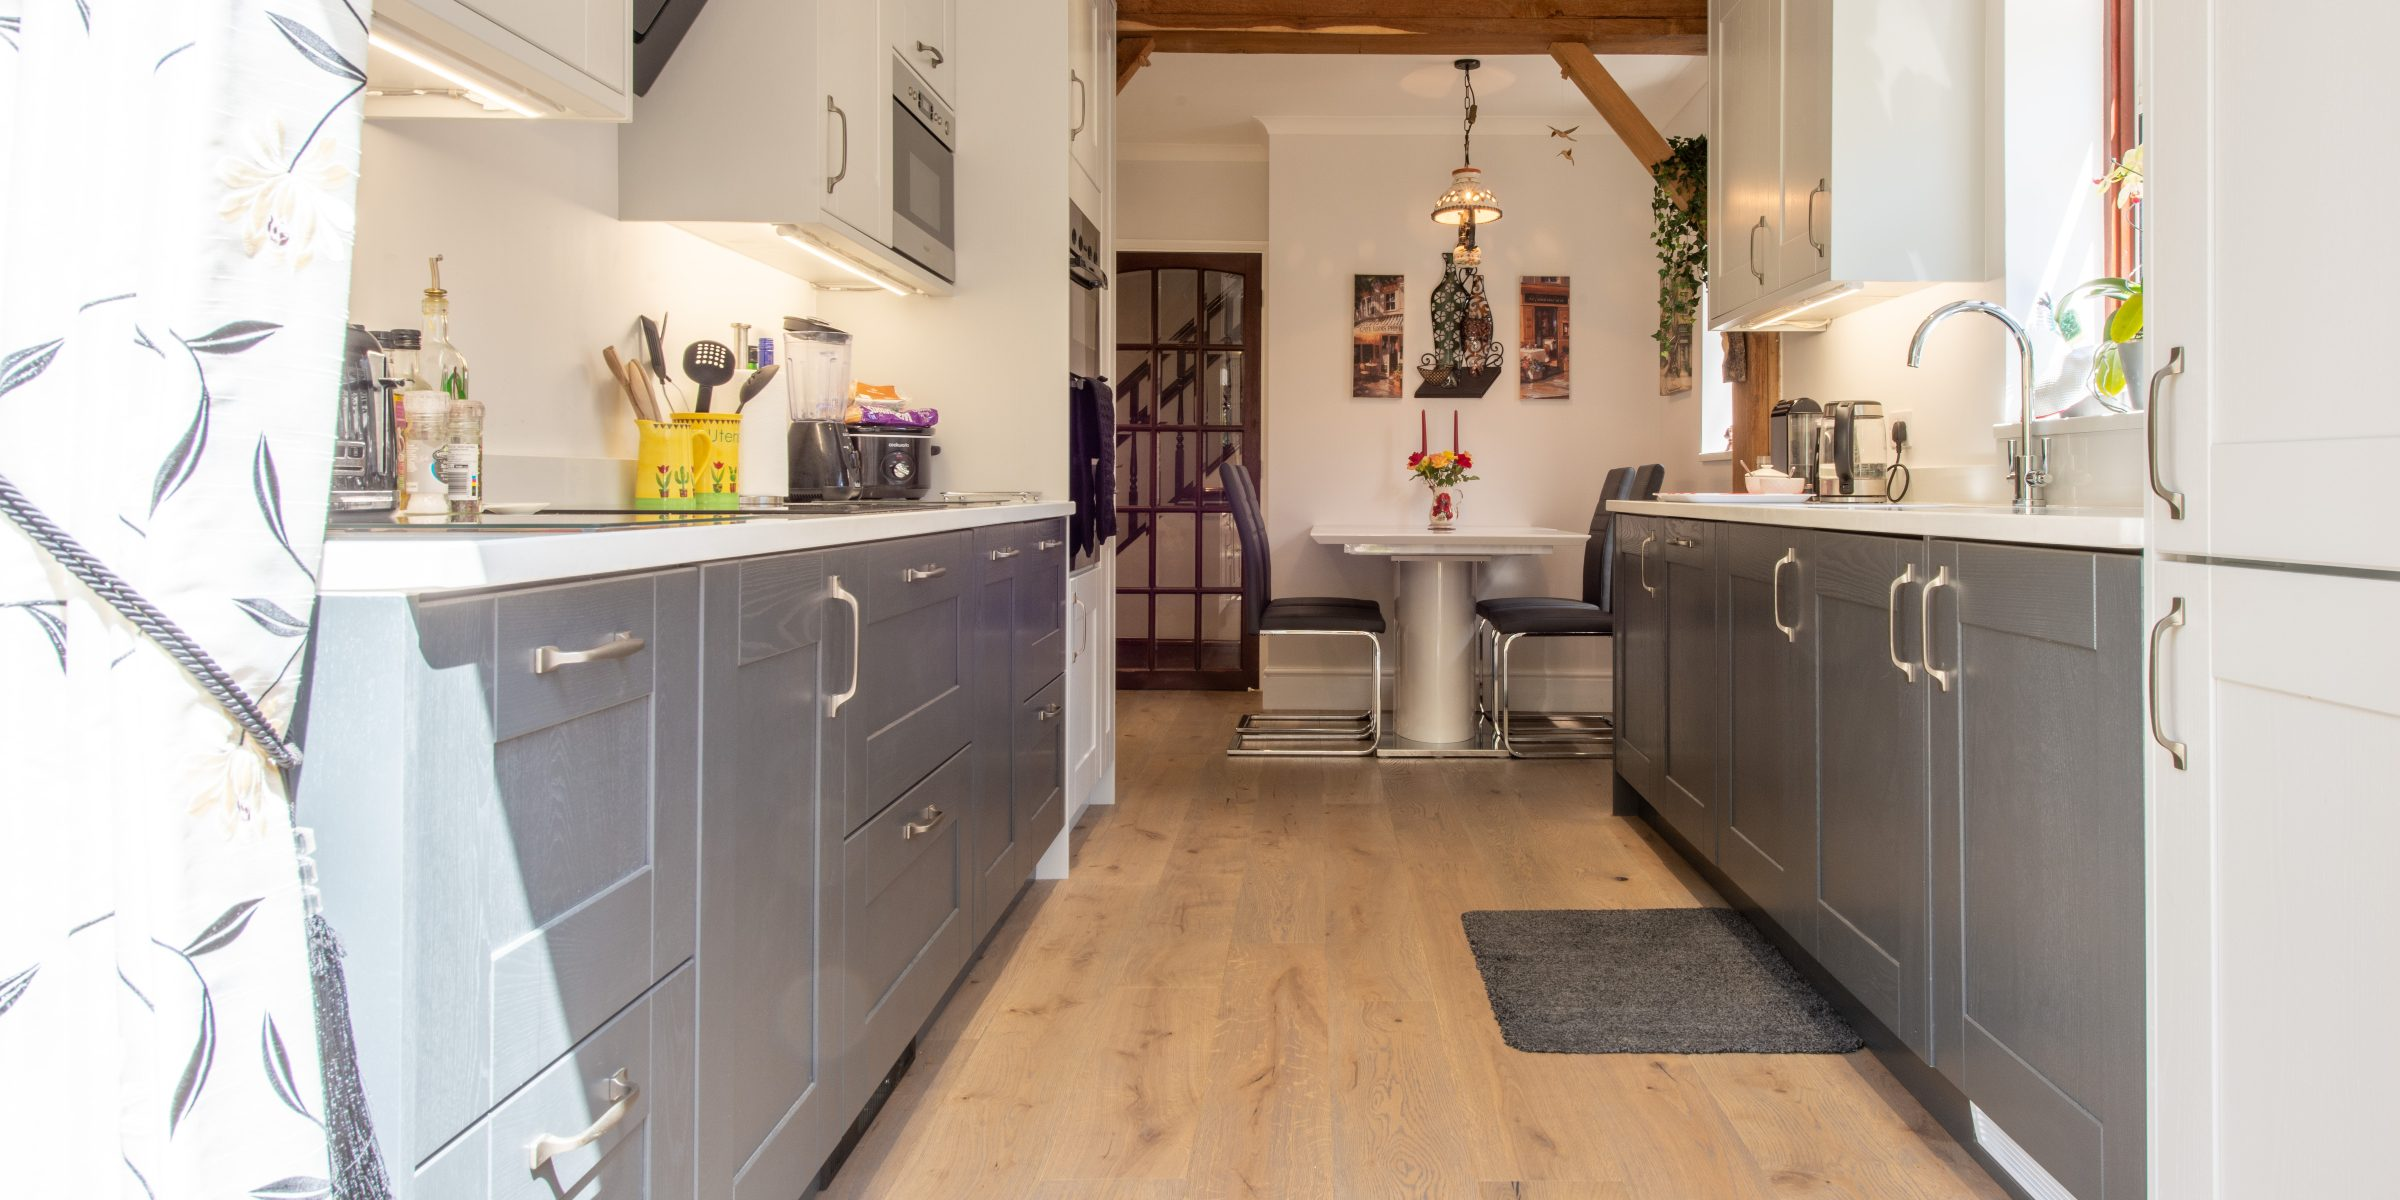 Deco frozen umber knaphill kitchen 3